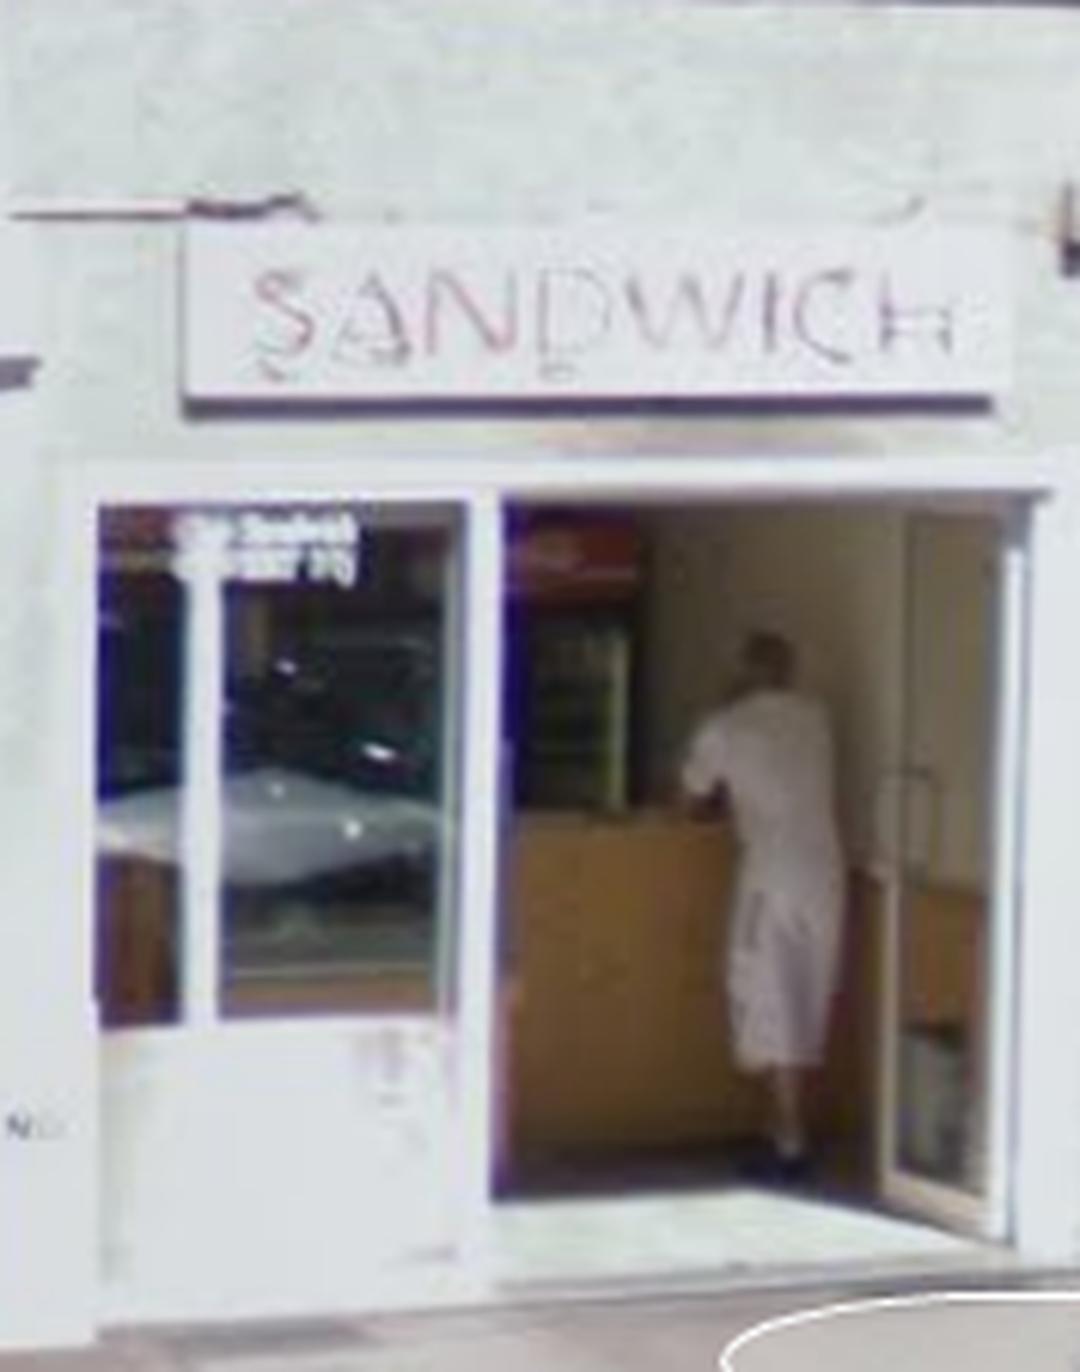 Photo of the February 5, 2016 6:52 PM, Club Sandwichs, 2 Rue Saint-Antoine, 73000 Chambéry, France